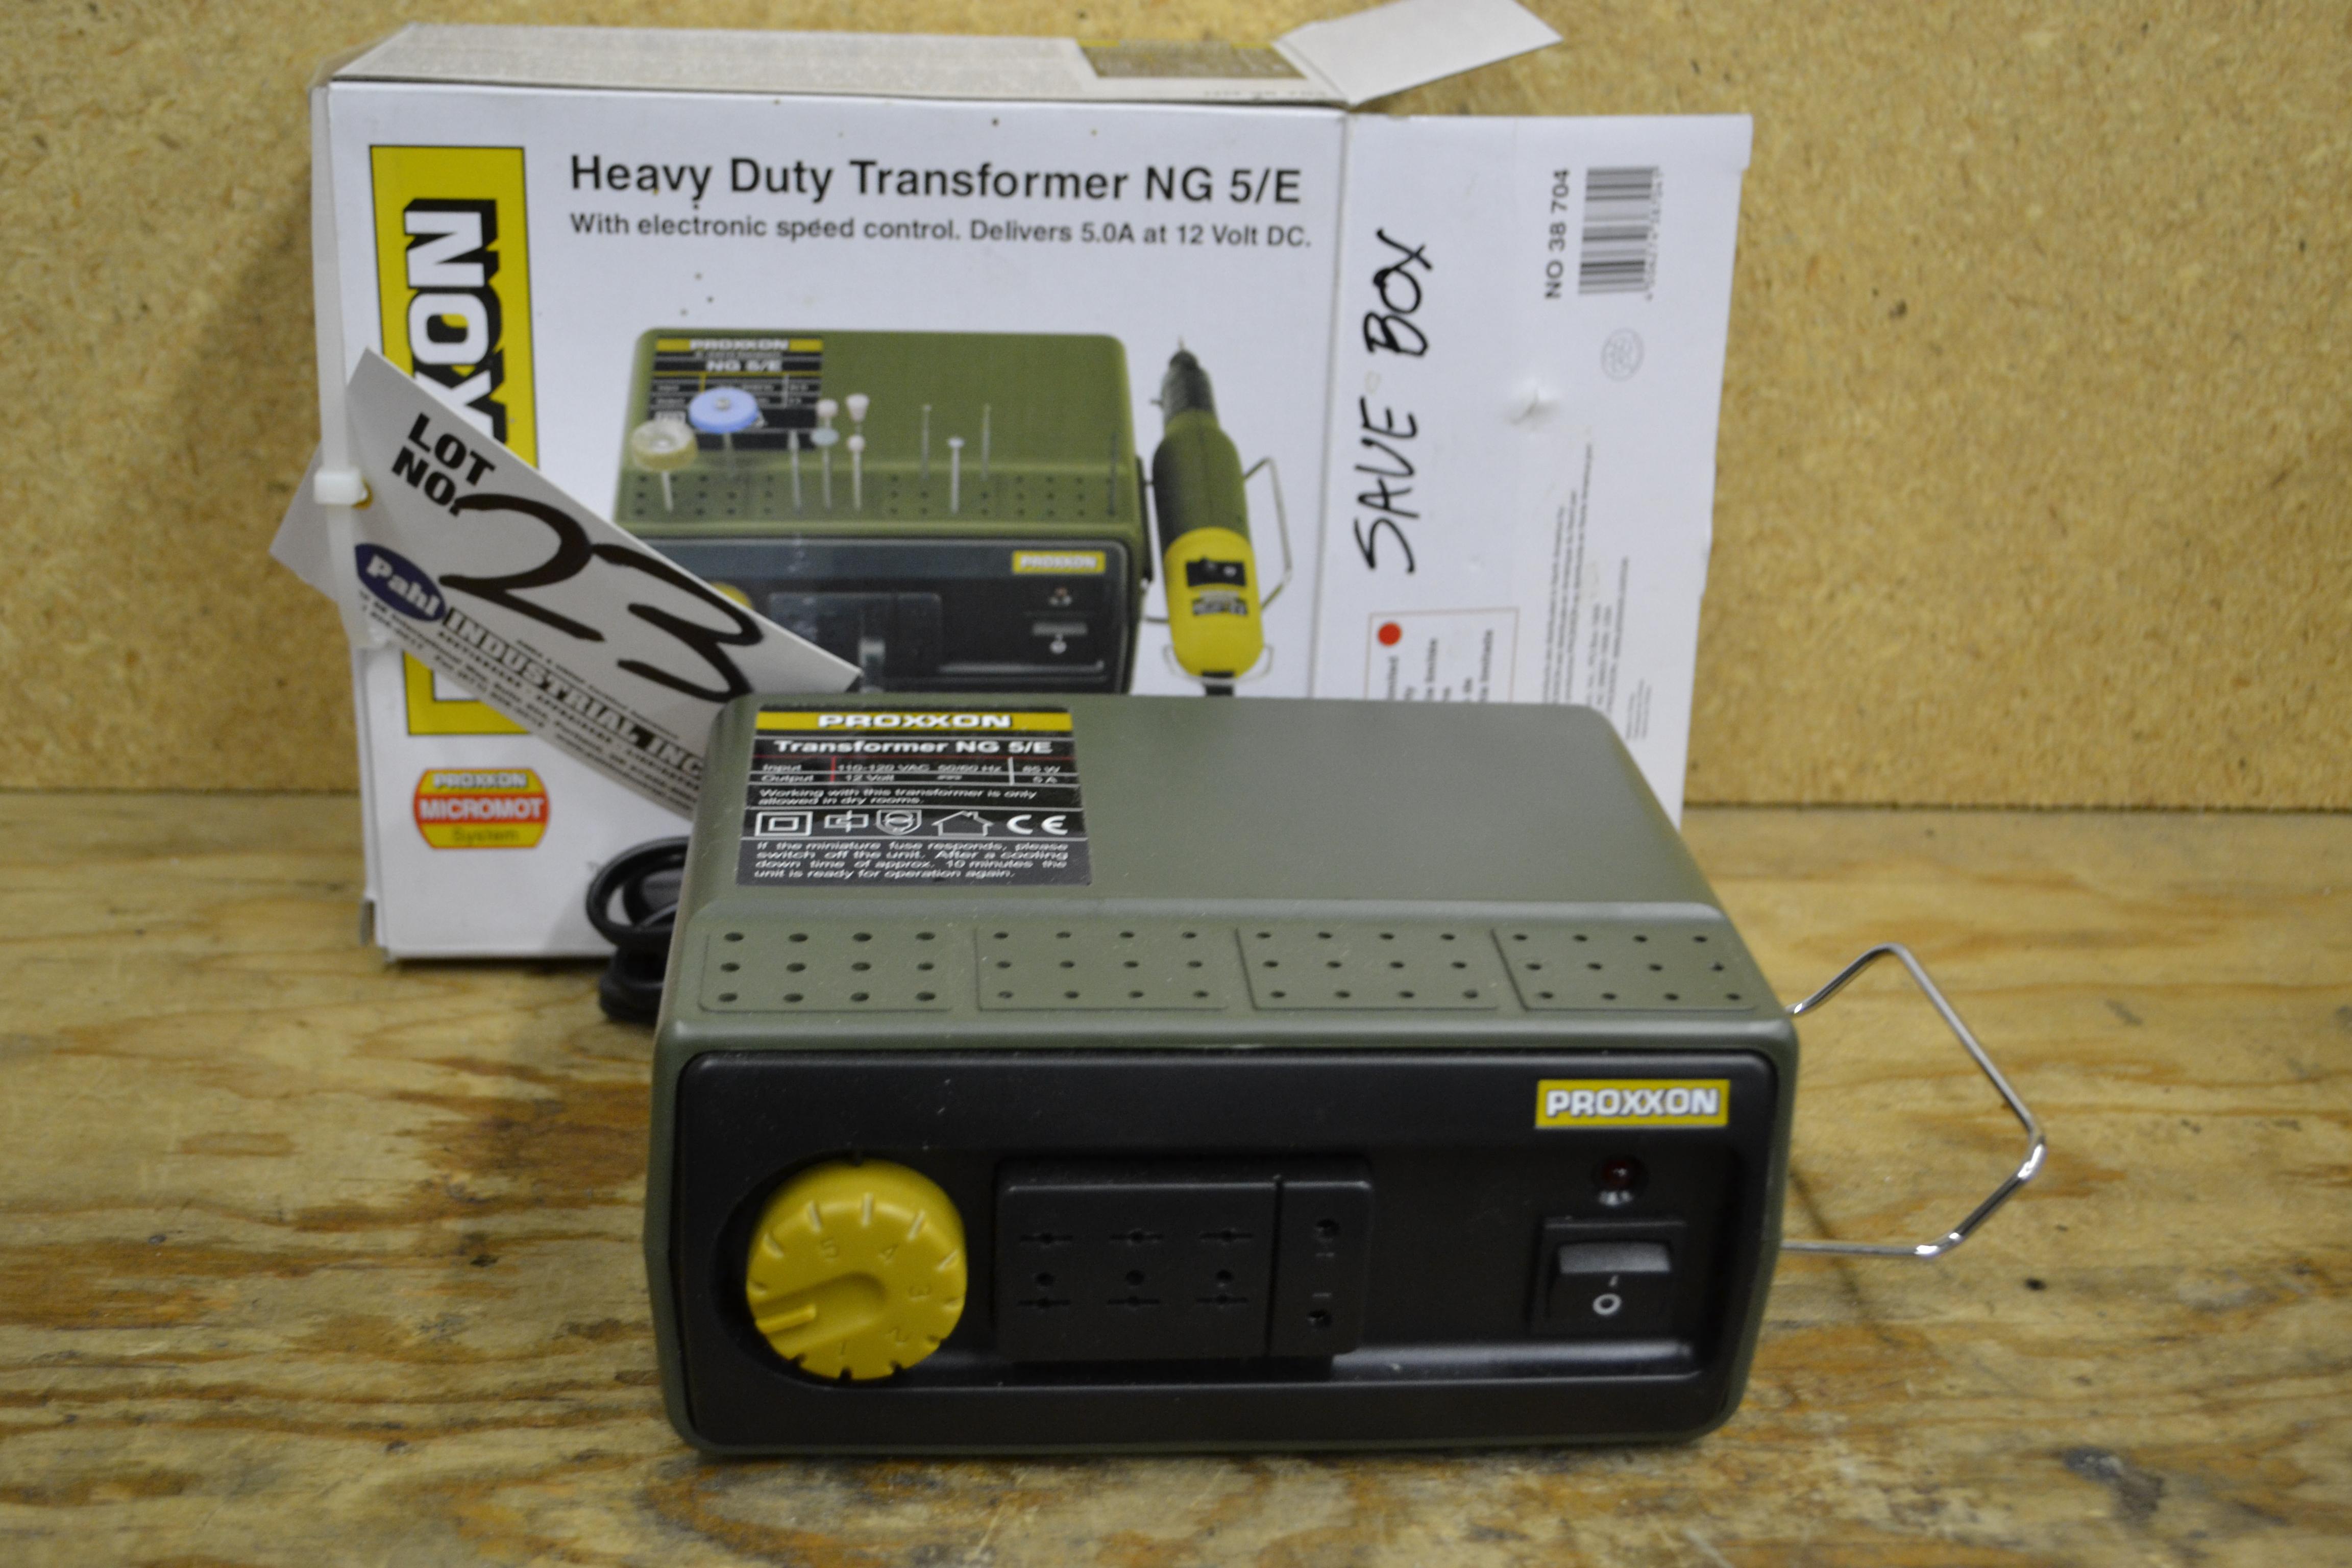 Proxxon Heavy Duty Transformer NG 5/E, Delivers 5.0A at 12V